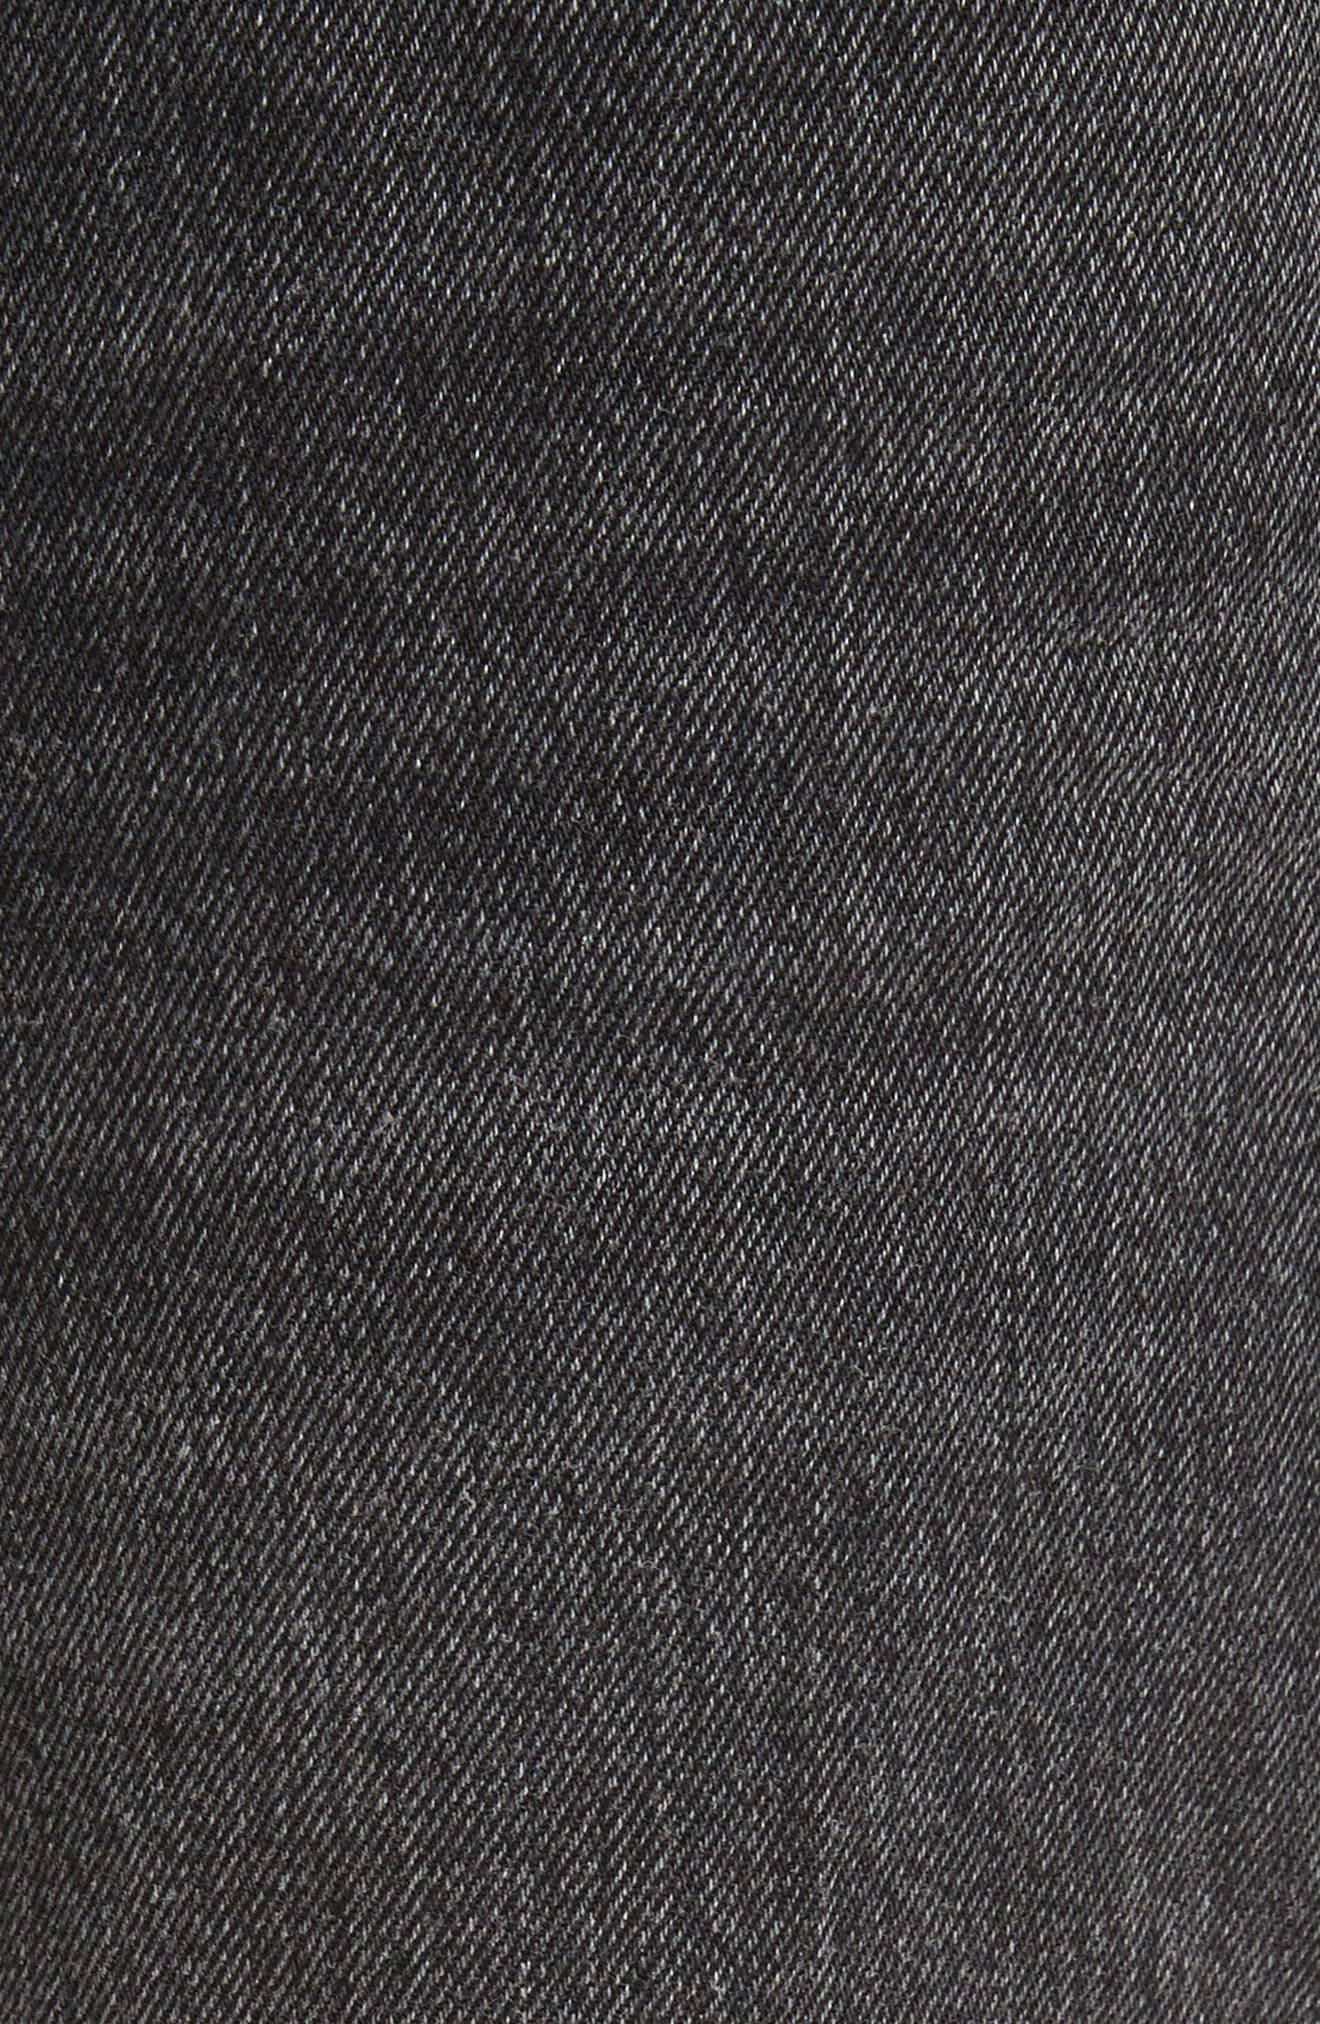 Denim x Alexander Wang Hybrid Sweatpants Jeans,                             Alternate thumbnail 5, color,